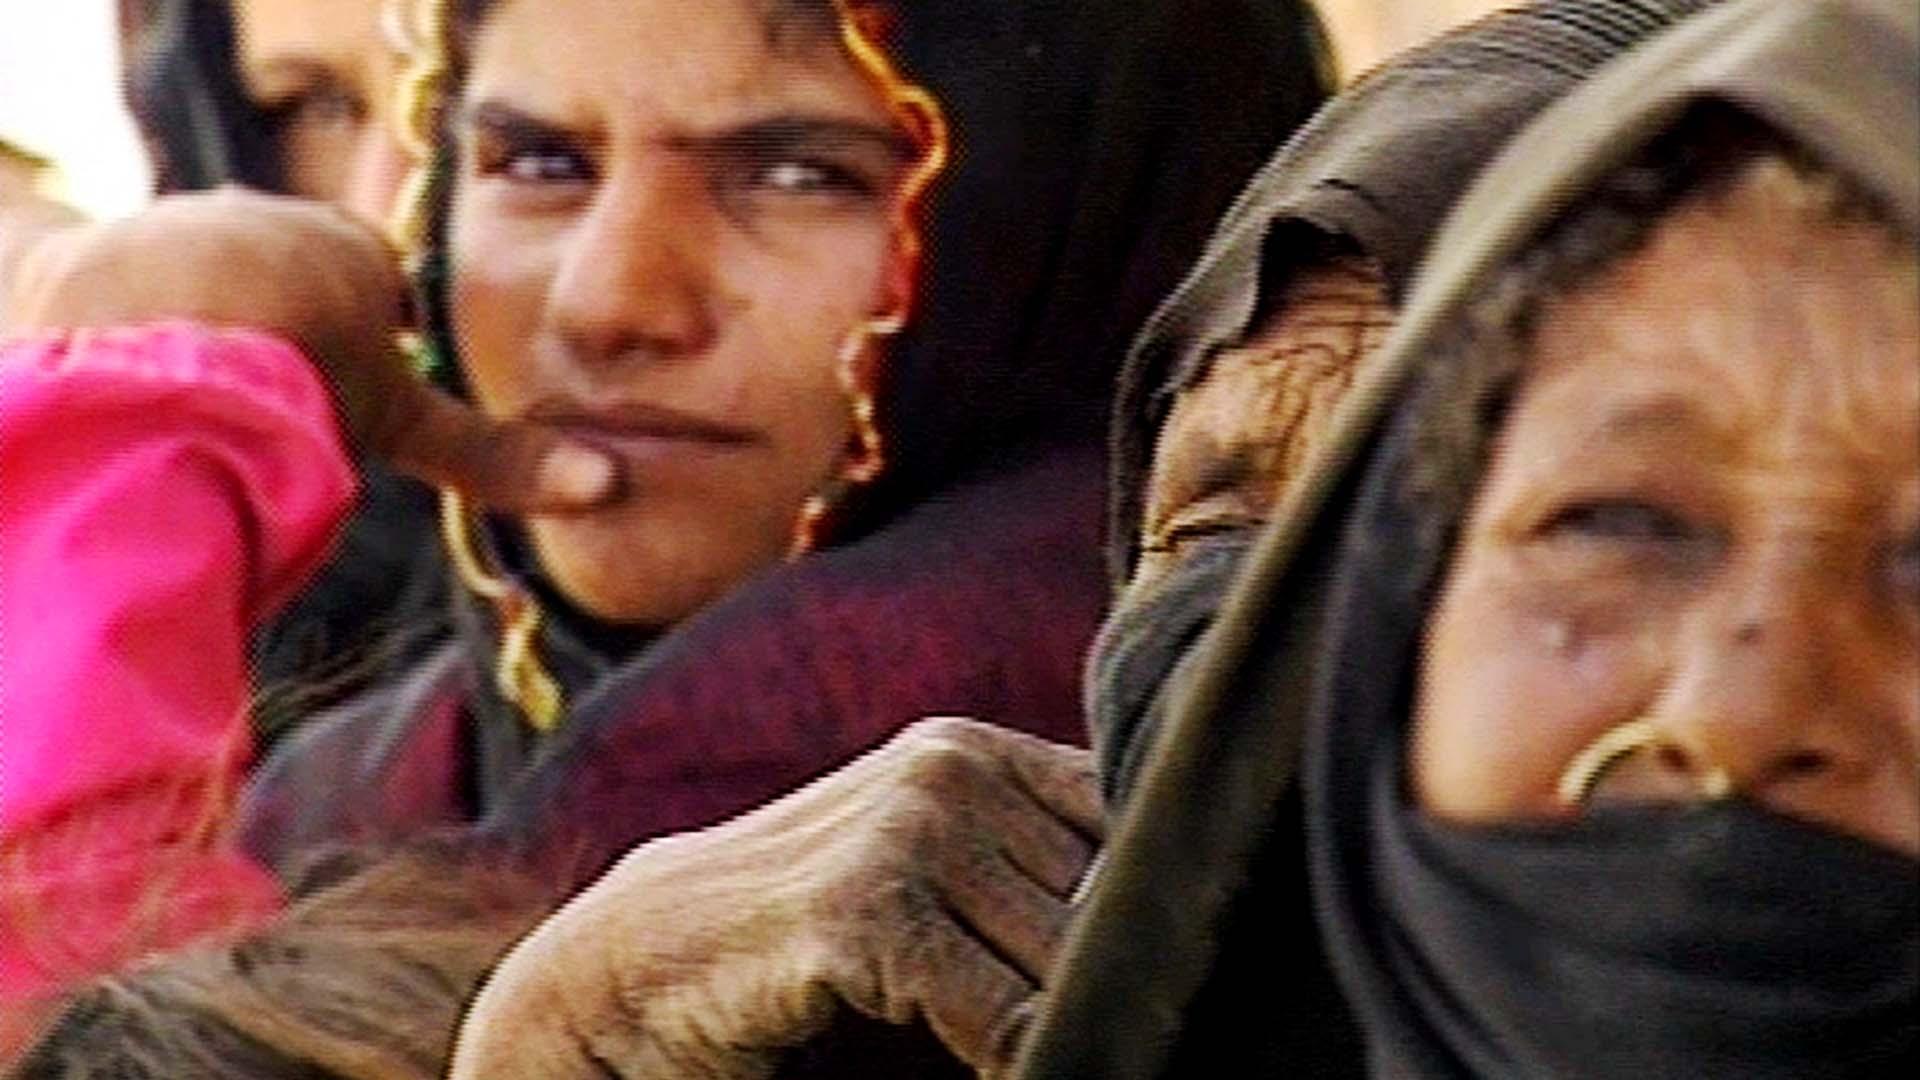 middle east women